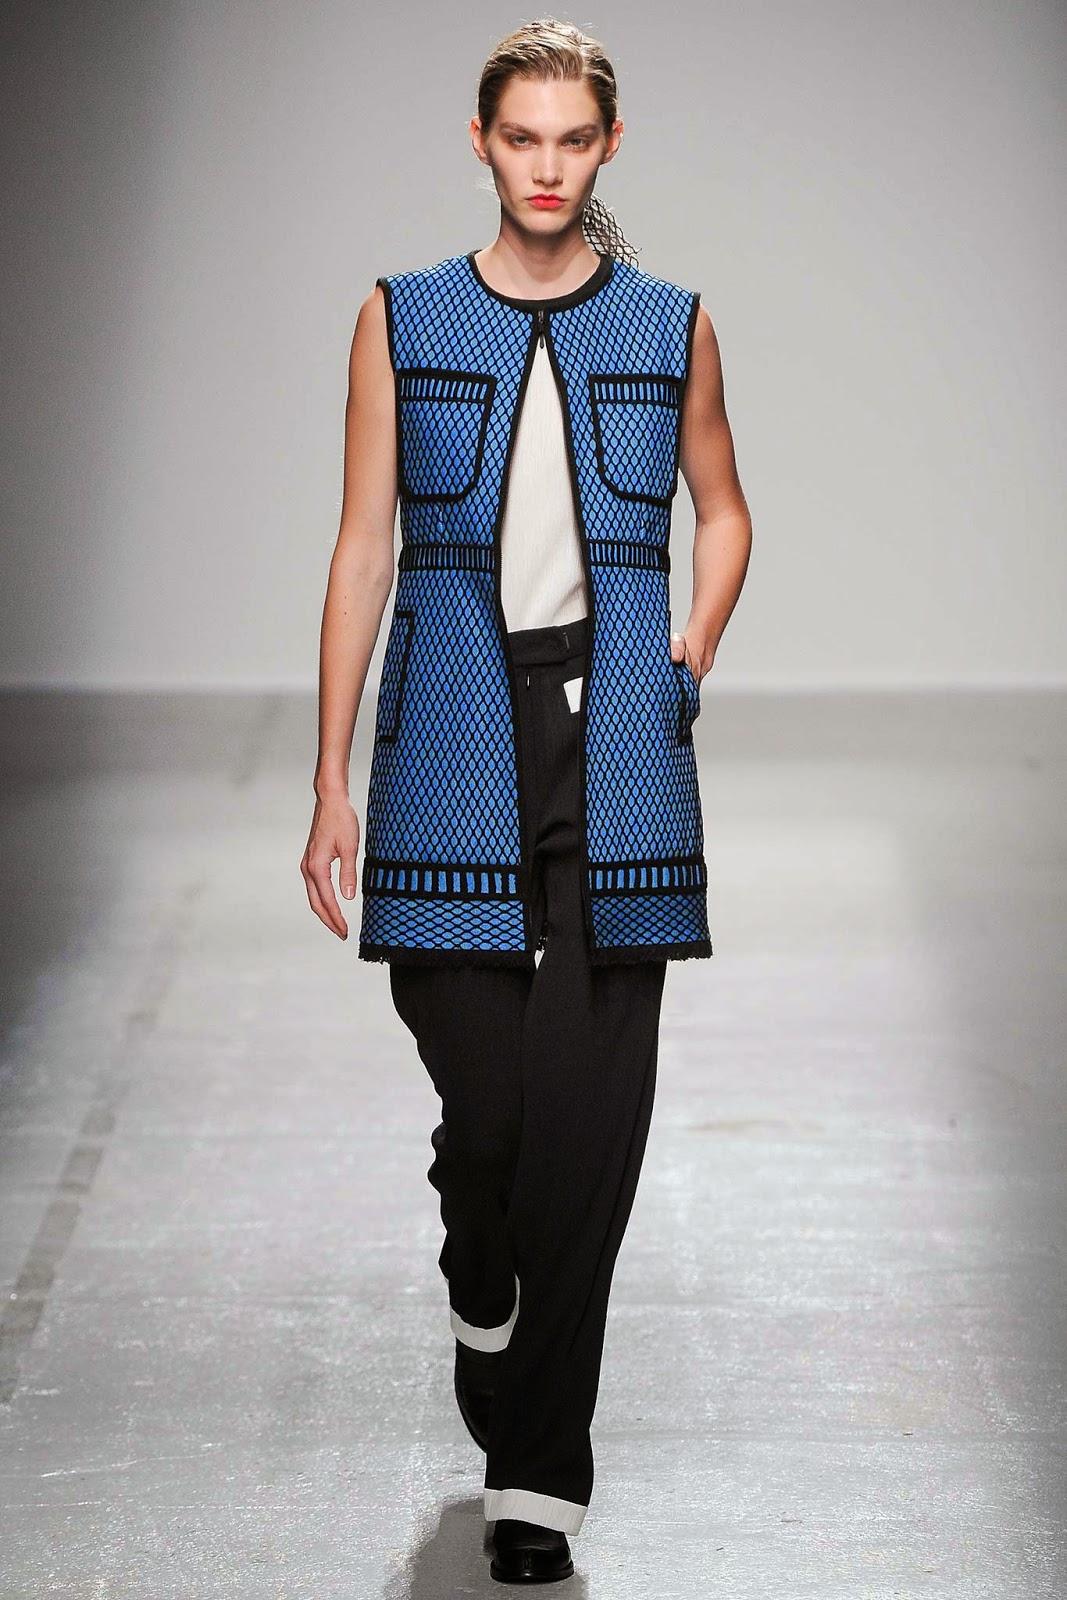 Avant Agency – Isabella Turner  |Avant Agency Model